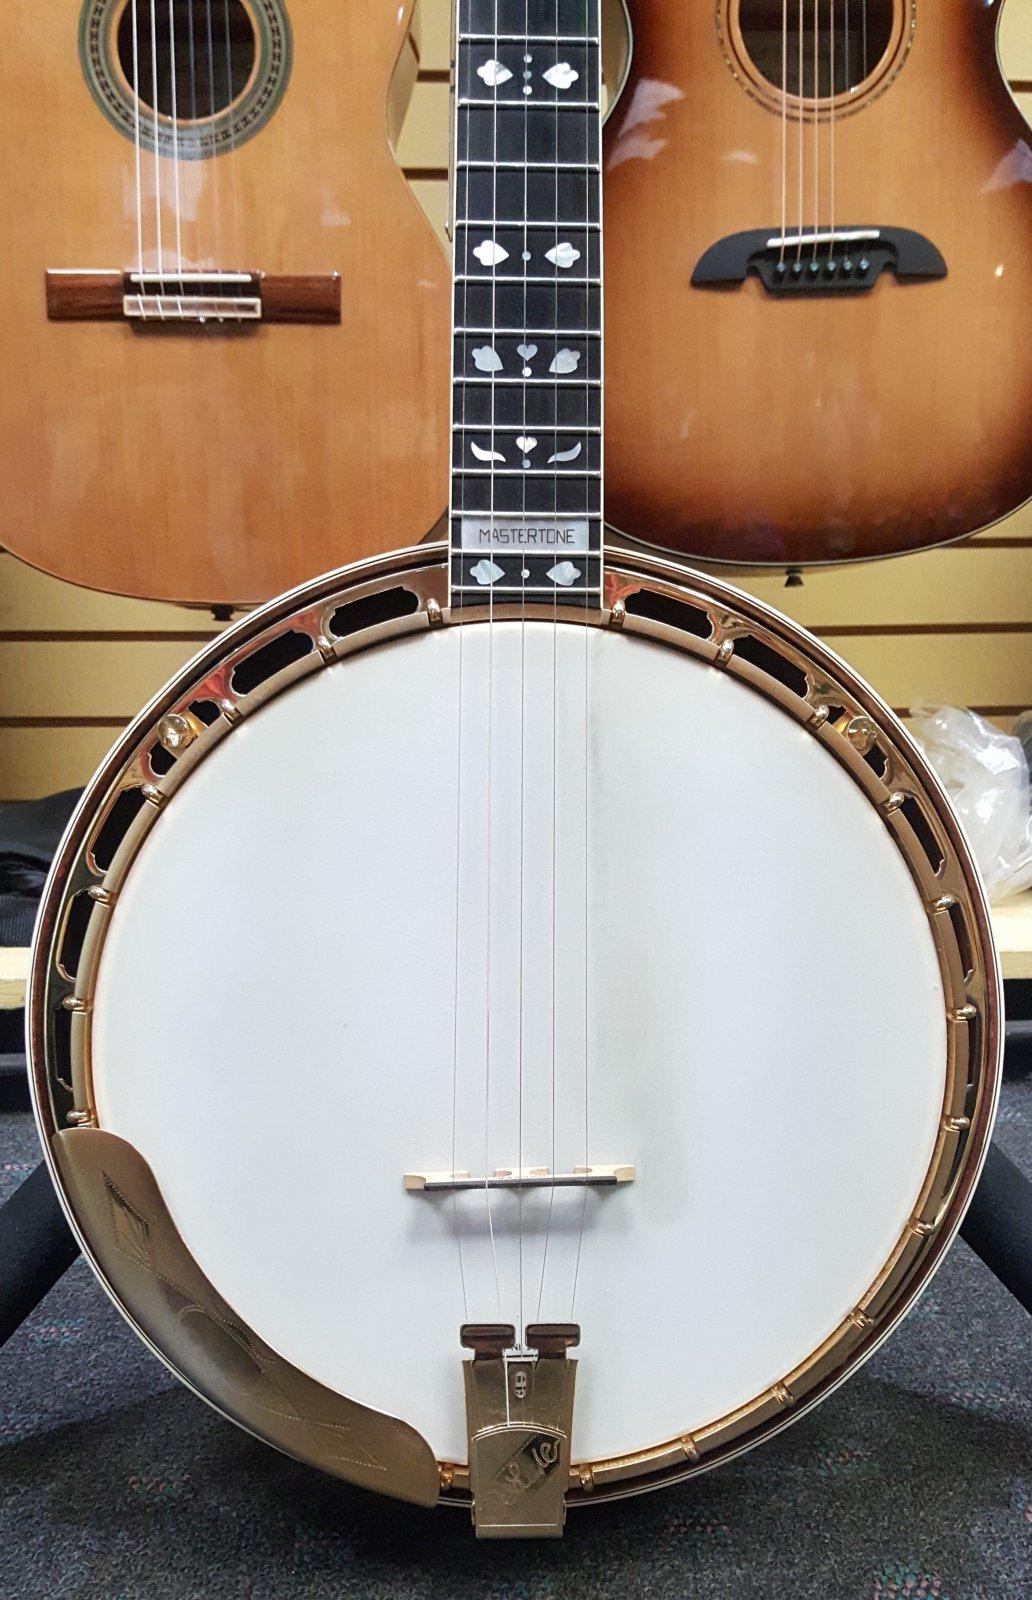 Gibson 1993 Earl Scruggs Golden Deluxe Mastertone Signature Model 5-String Banjo w/ Hardshell Case